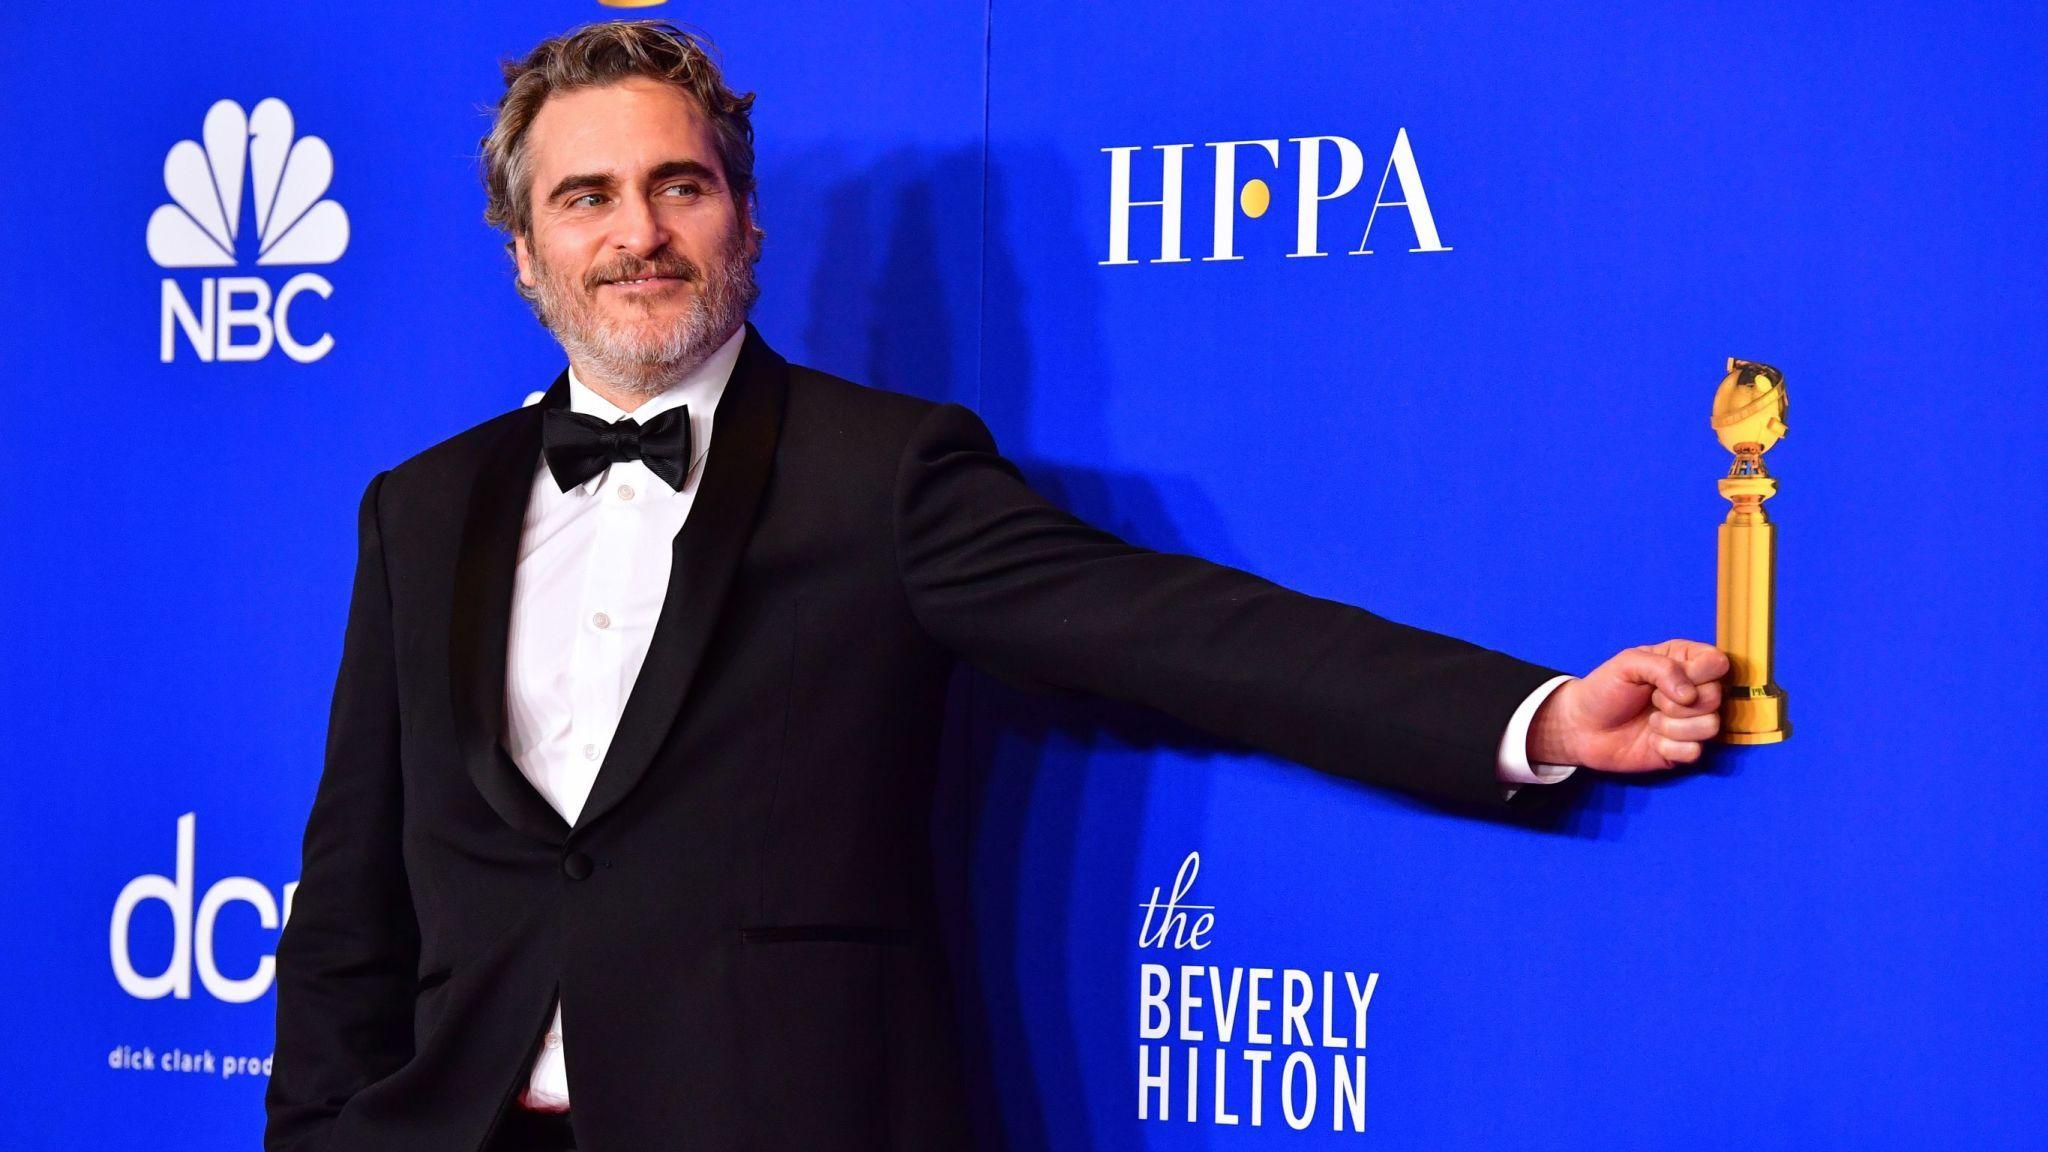 Golden Globes best actor (drama) Joaquin Phoenix